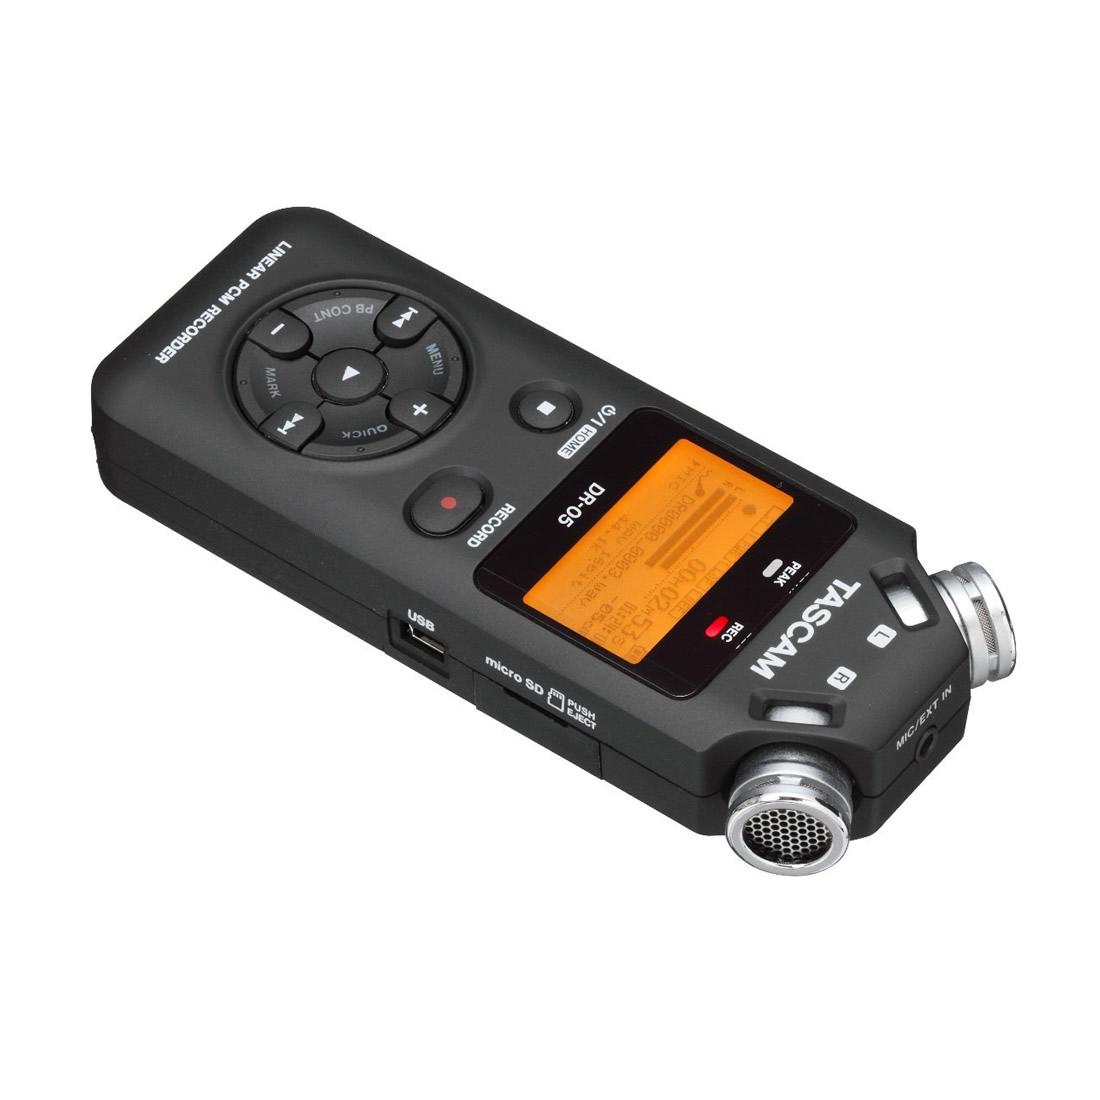 Tascam DR-05 Gravador Digital de Áudio Voz, Preto, +4Gb